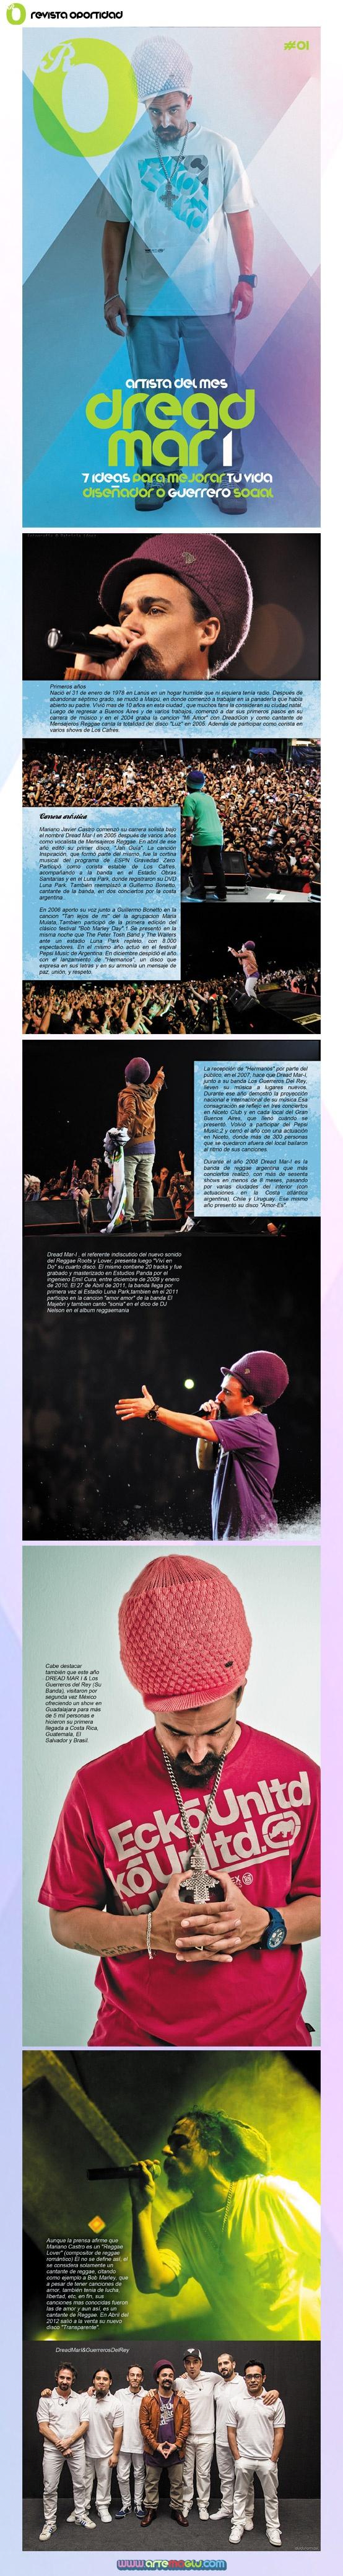 Revista Oportunidad  Tema del mes: Gerreros musicales  Dread Mar I...